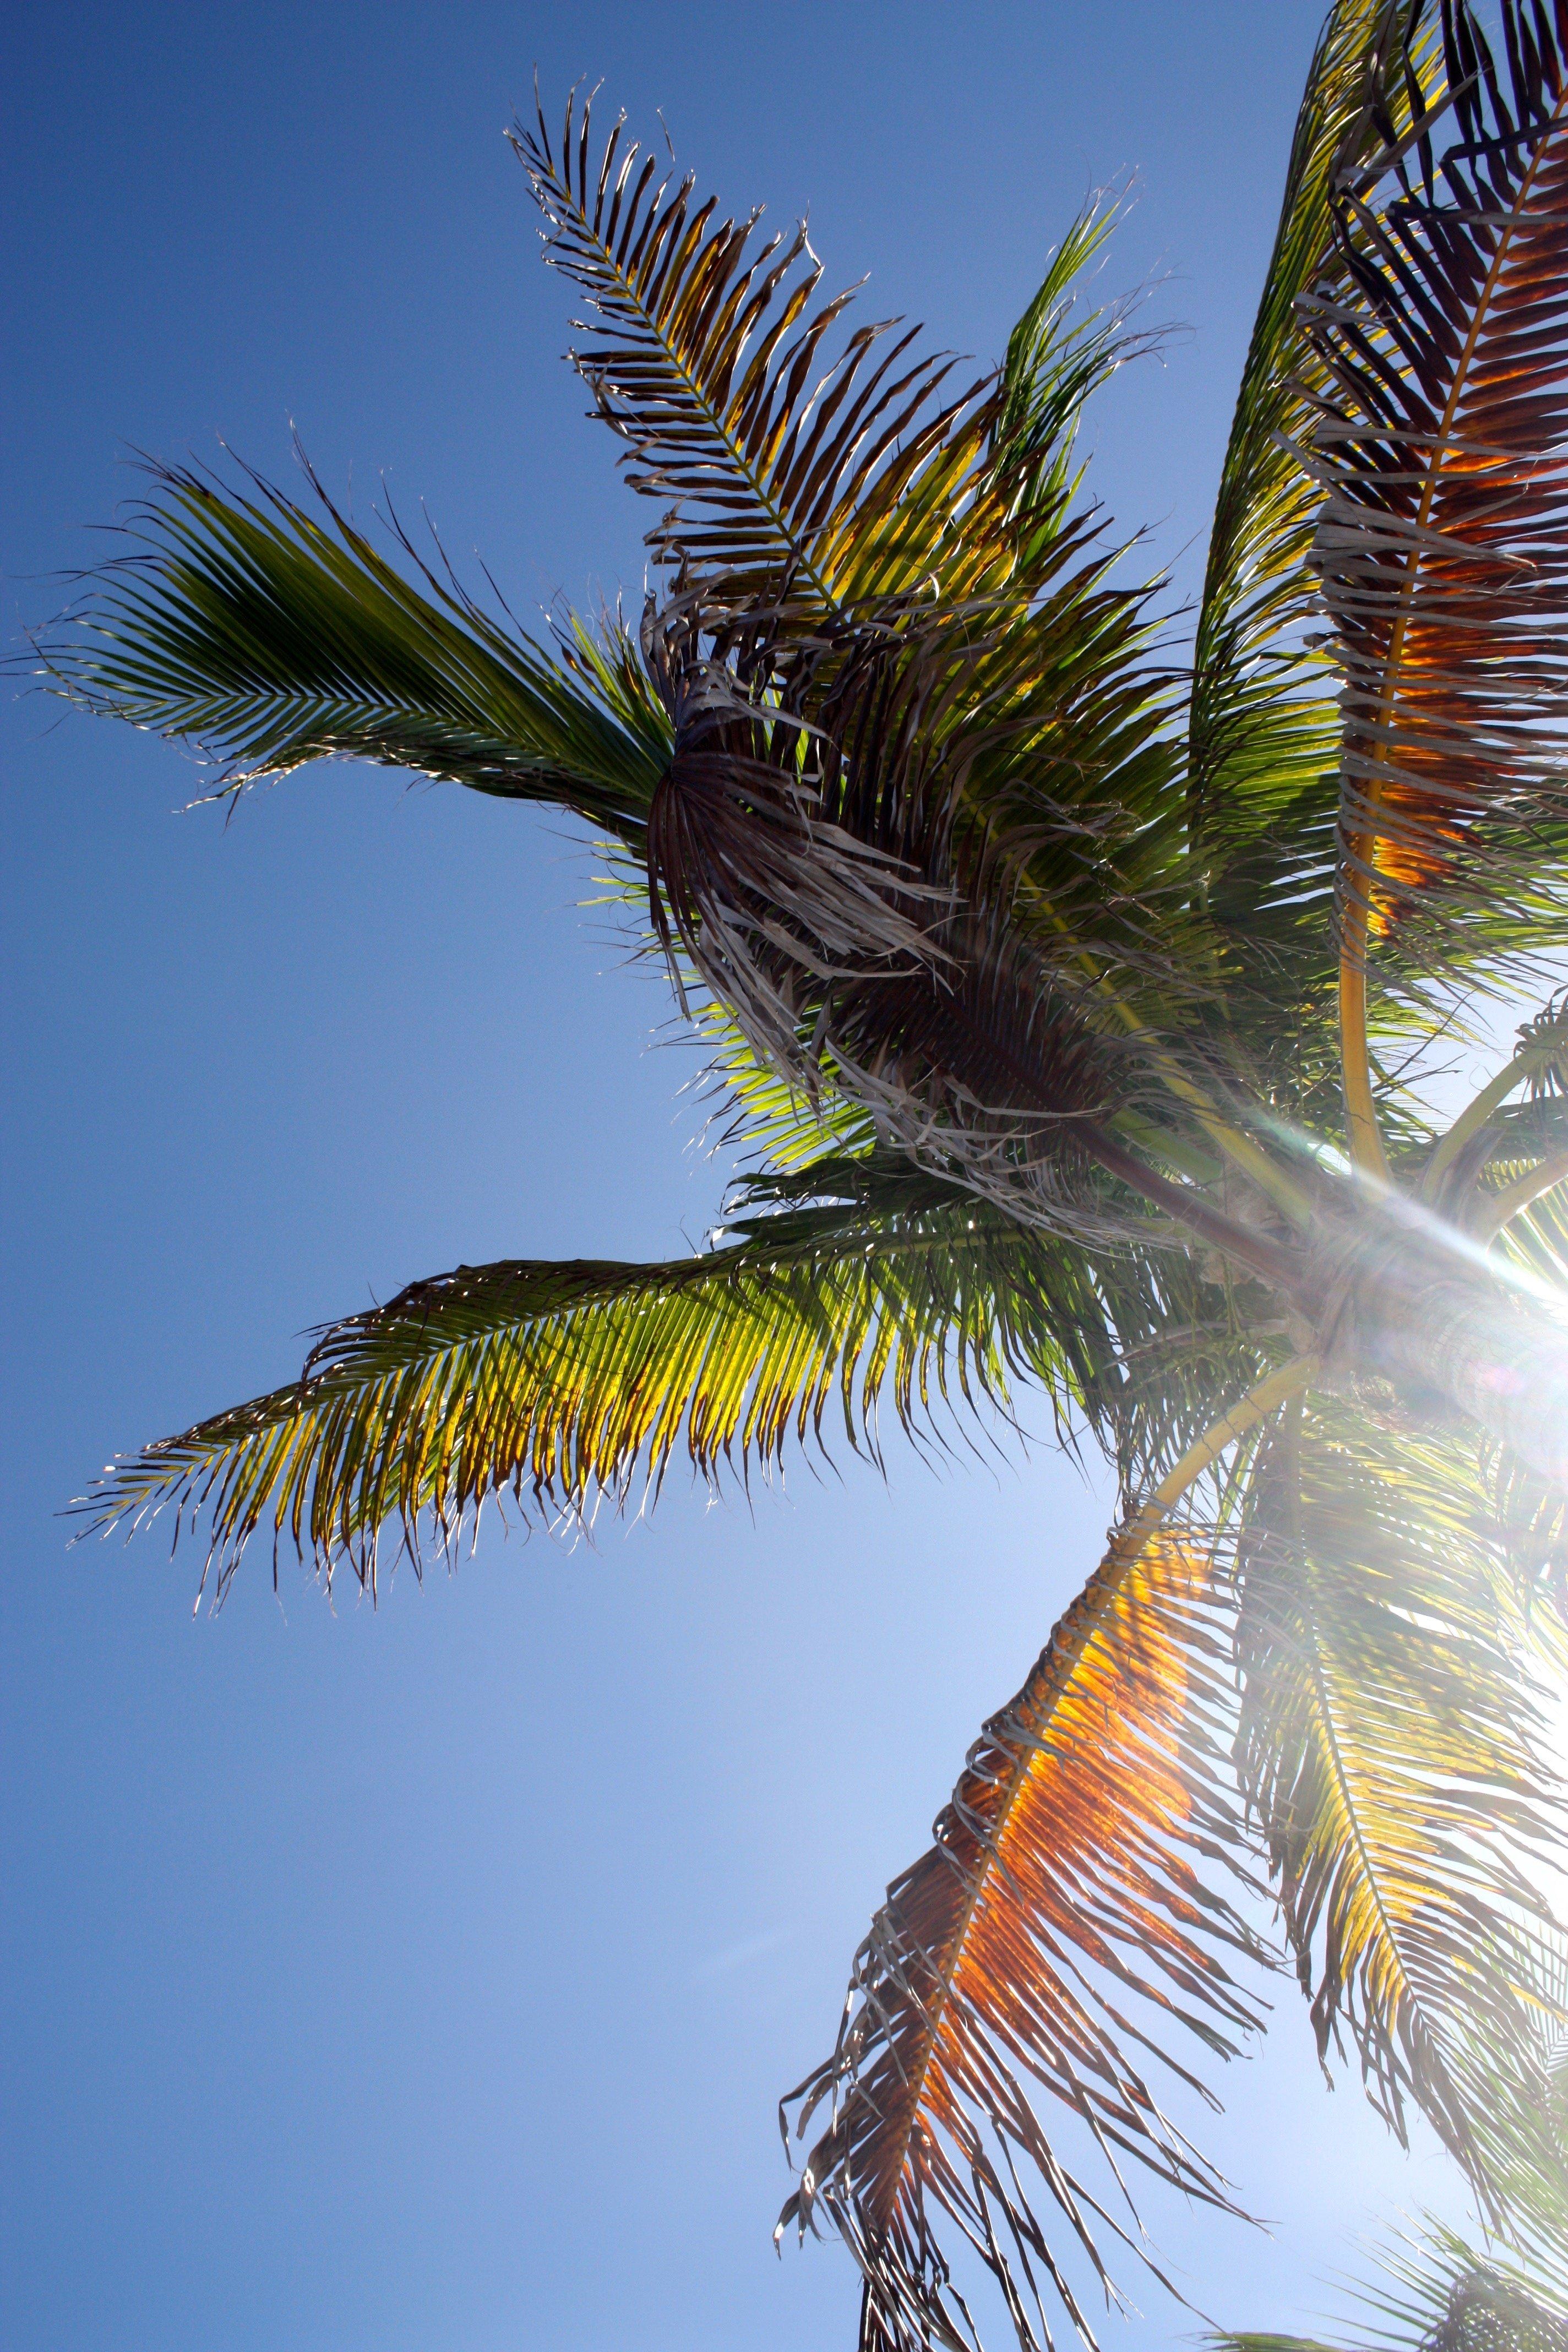 Bahamas - Great Stirrup Cay - The Good Rogue